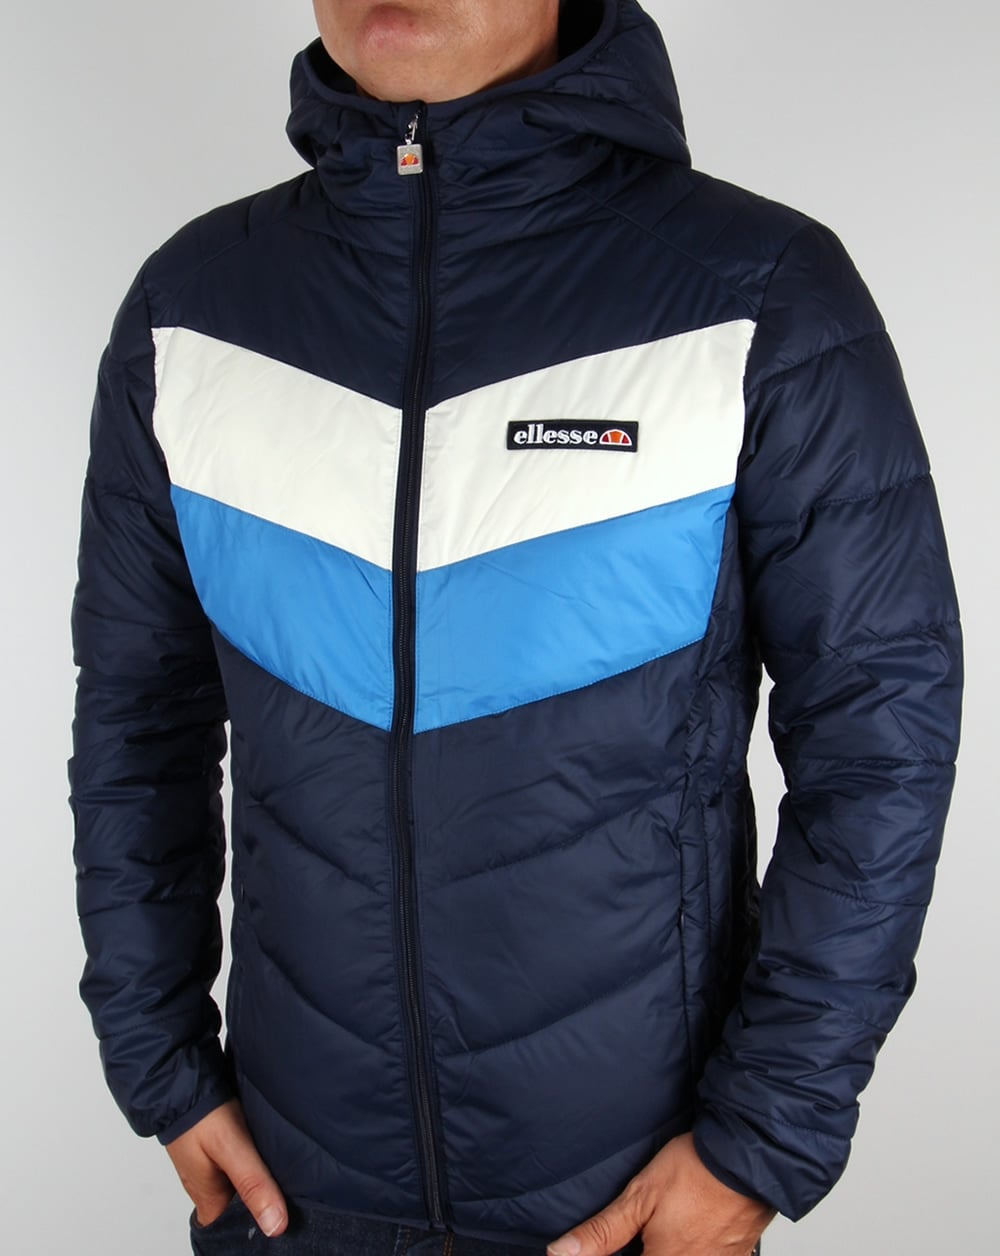 Ellesse Ellesse Ski Jacket Navy Blue 40abf70ea34f